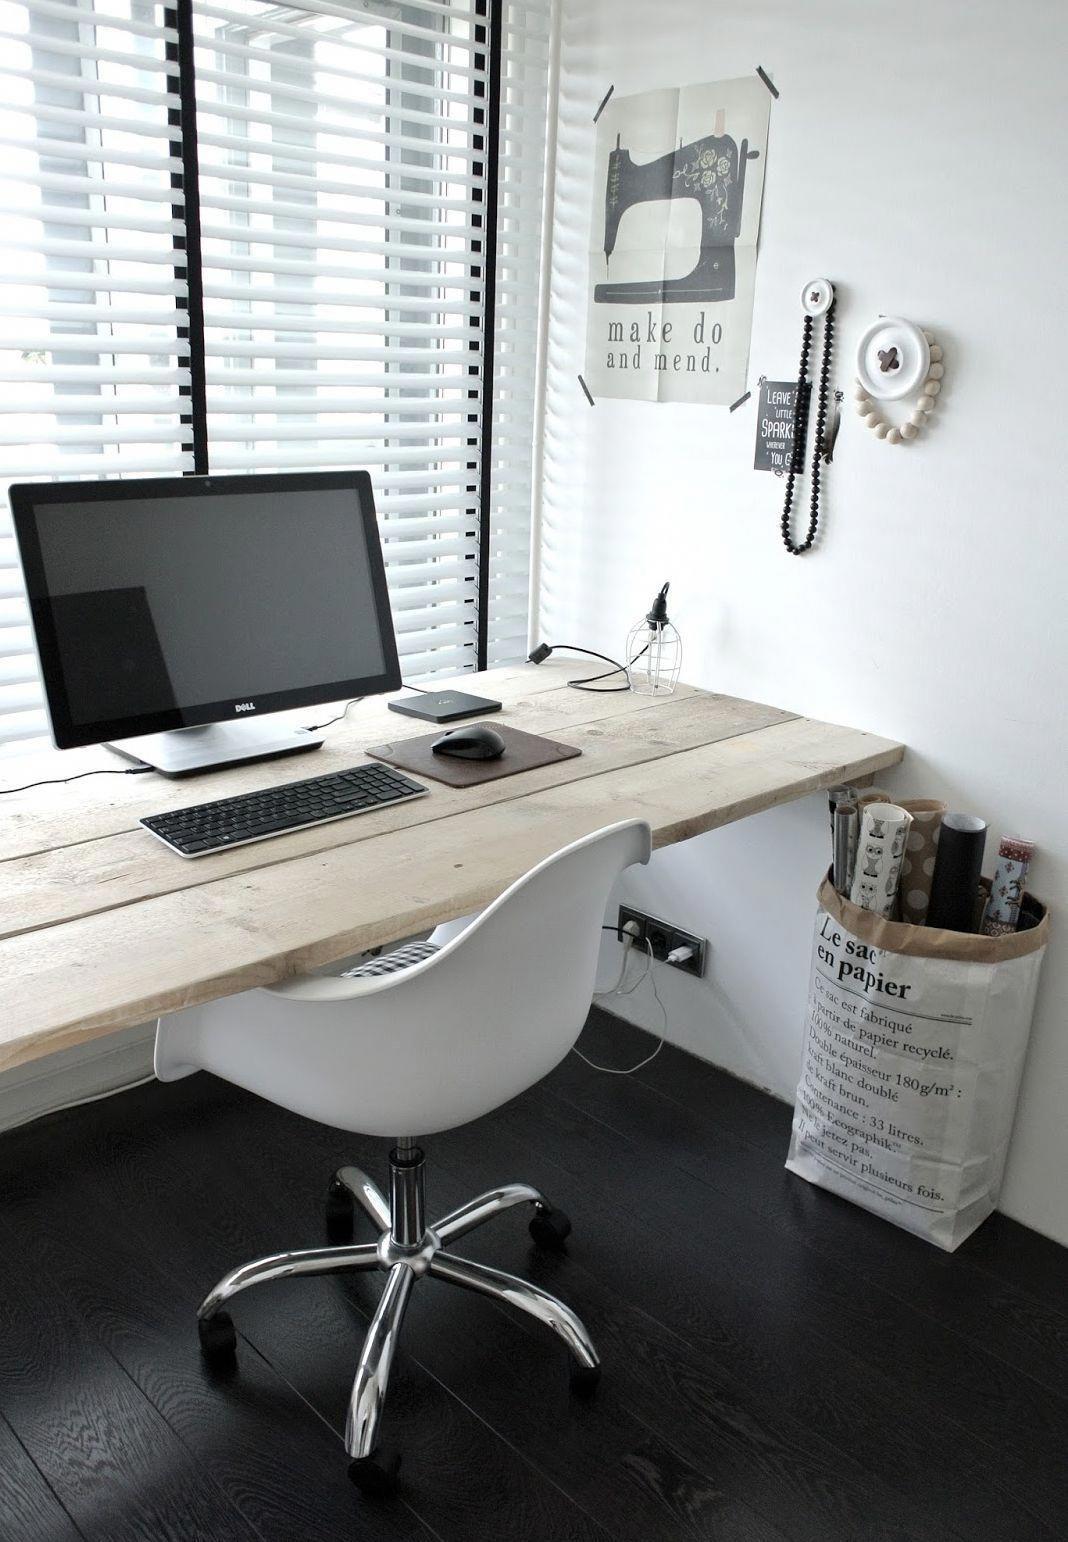 Desks bedroom ideas room decor gaming desk bedroom desk lamp